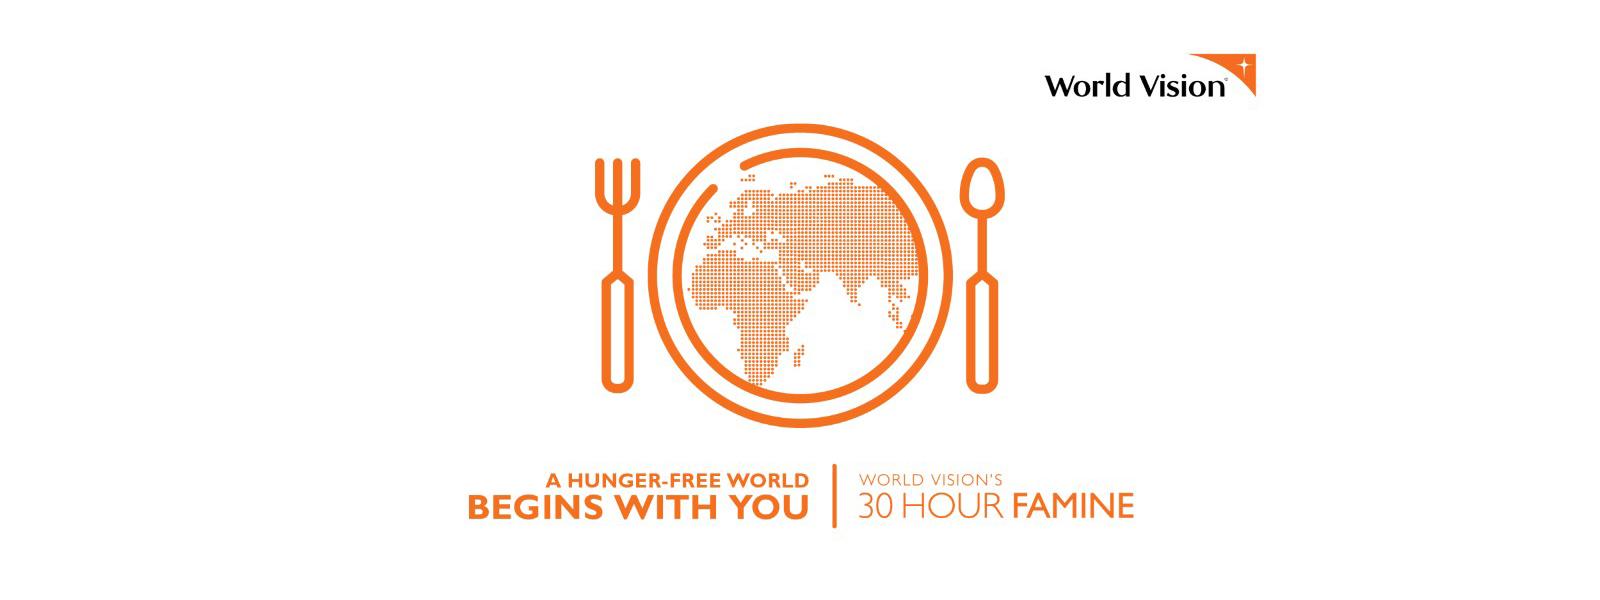 World Vision's 30 Hour Famine.